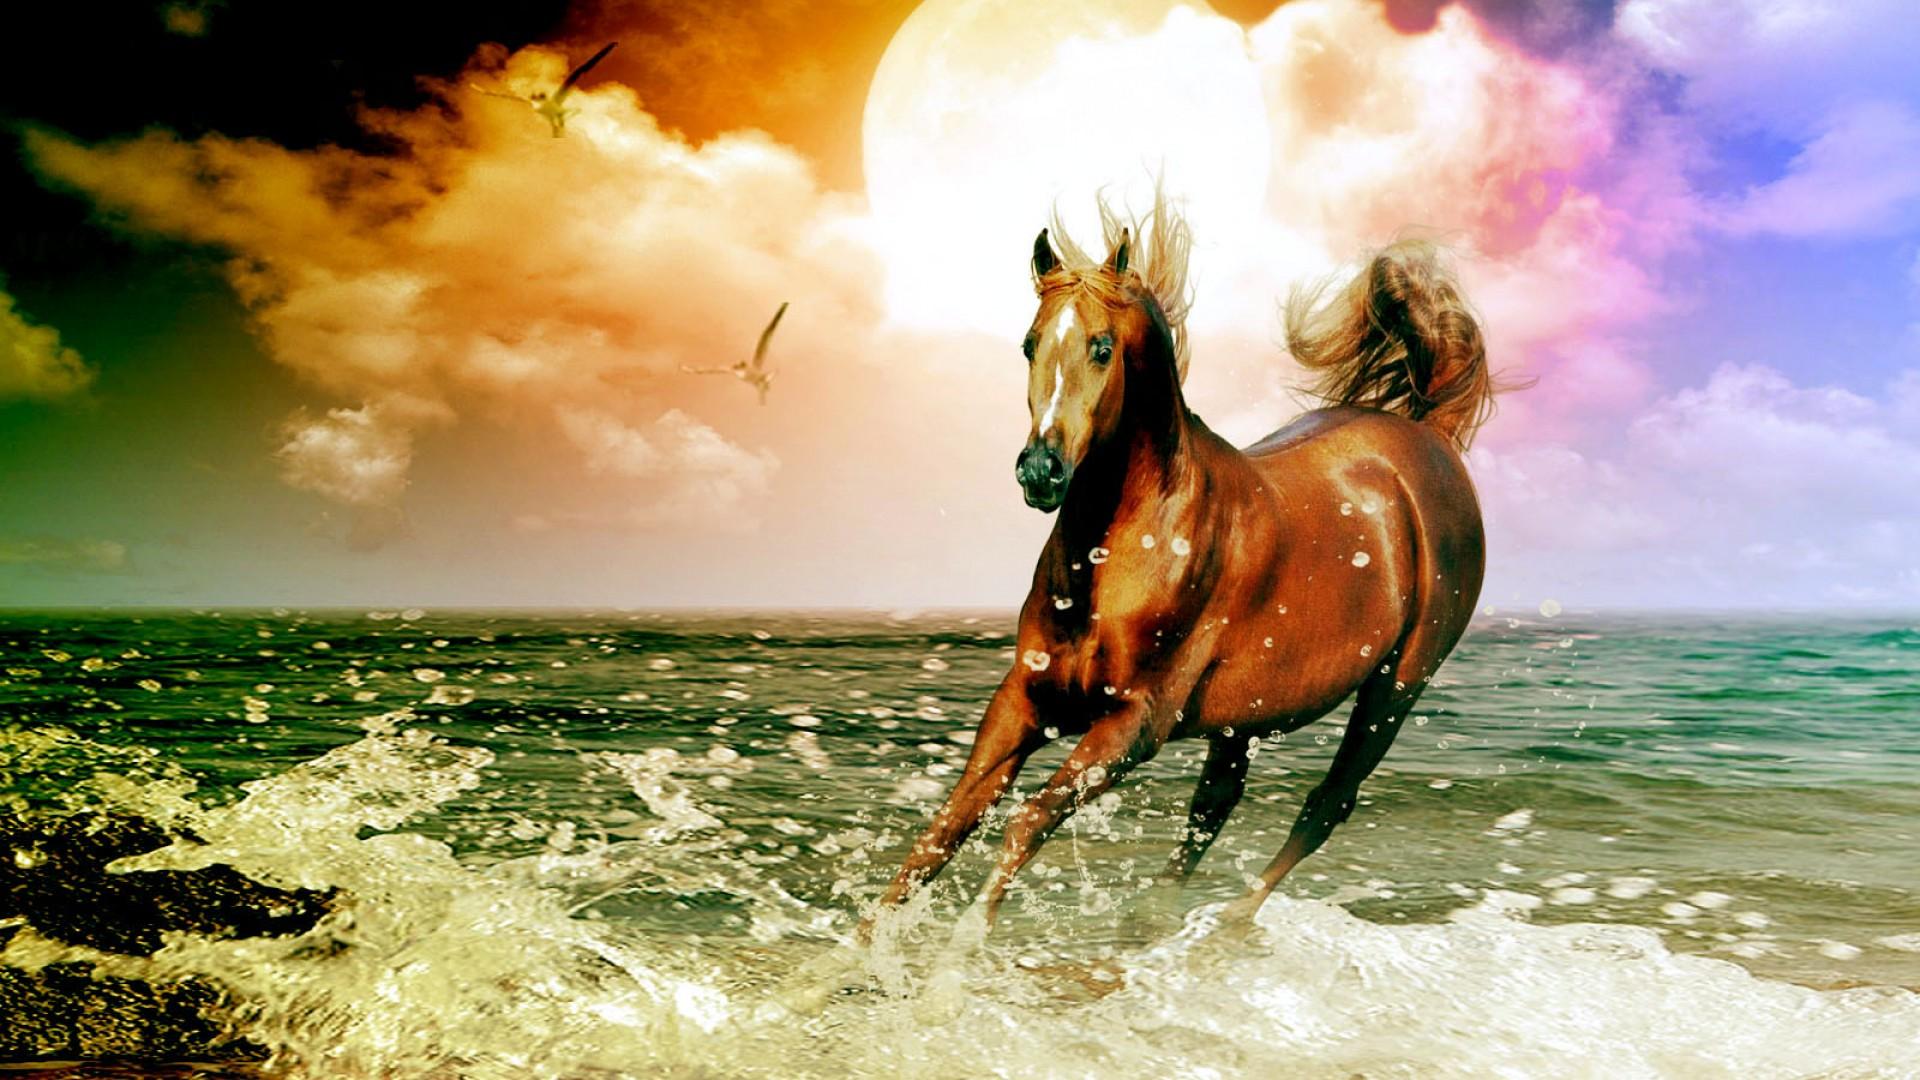 Horse Beach Desktop Wallpaper and make this wallpaper for your desktop 1920x1080